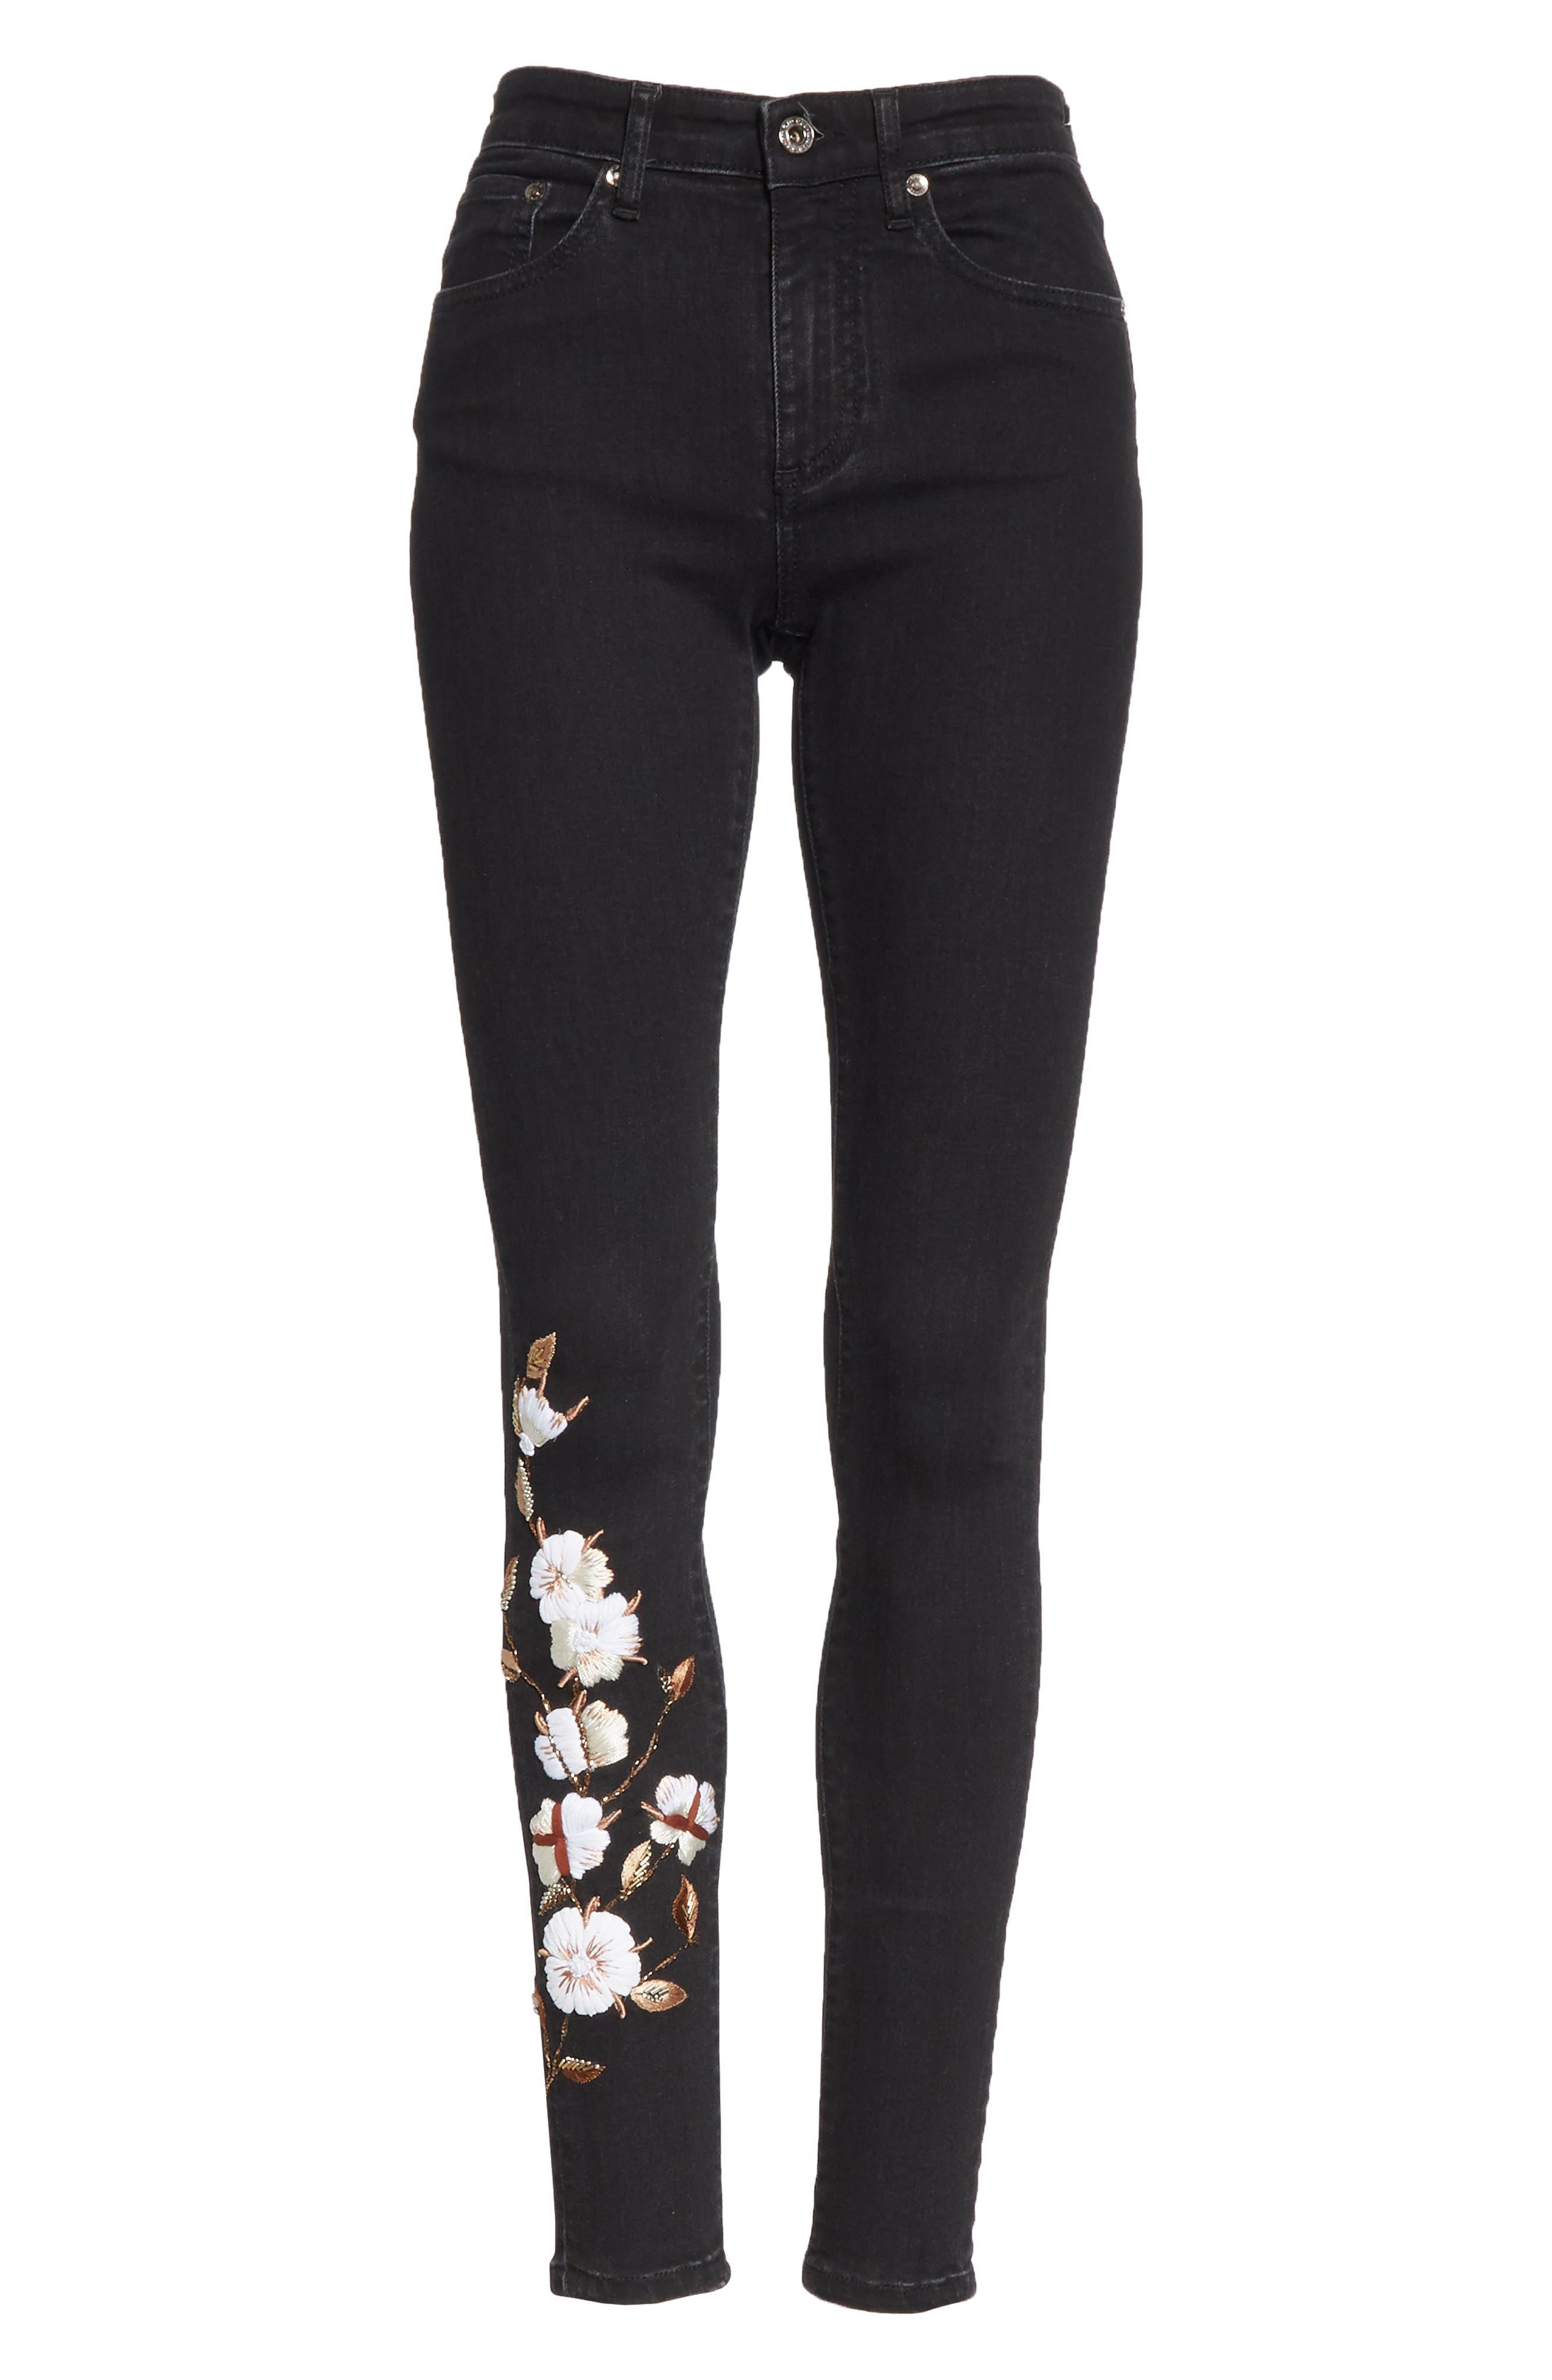 OFF-WHITE, Floral Embroidered Diagonal Stripe Skinny Jeans, Alternate thumbnail 6, color, VINTAGE BLACK